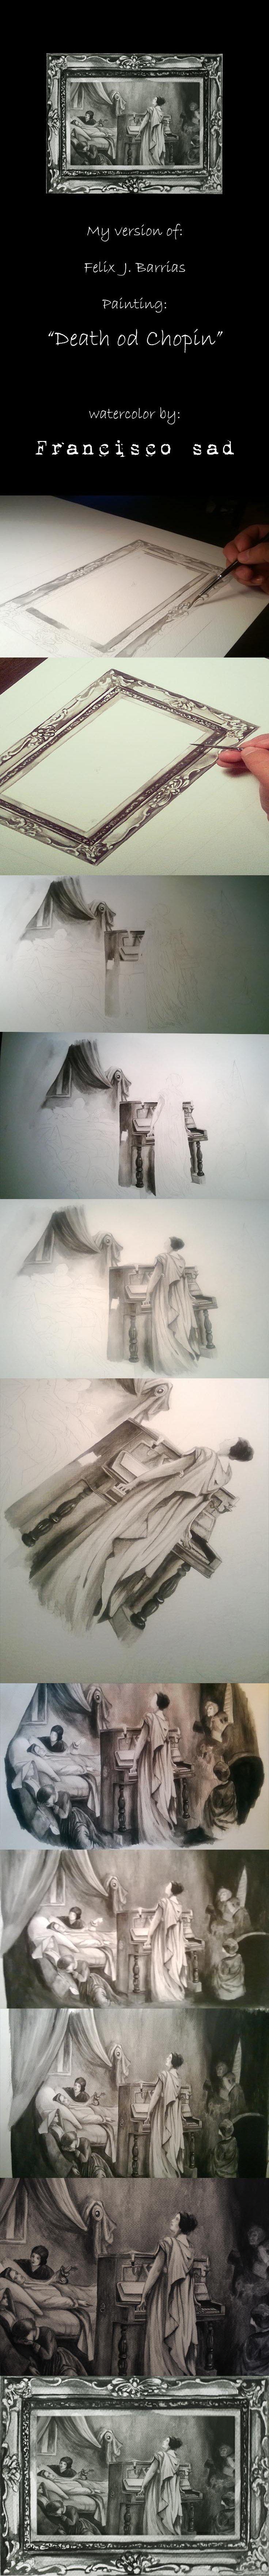 tutorial, watercolor inspired in chopi dead night